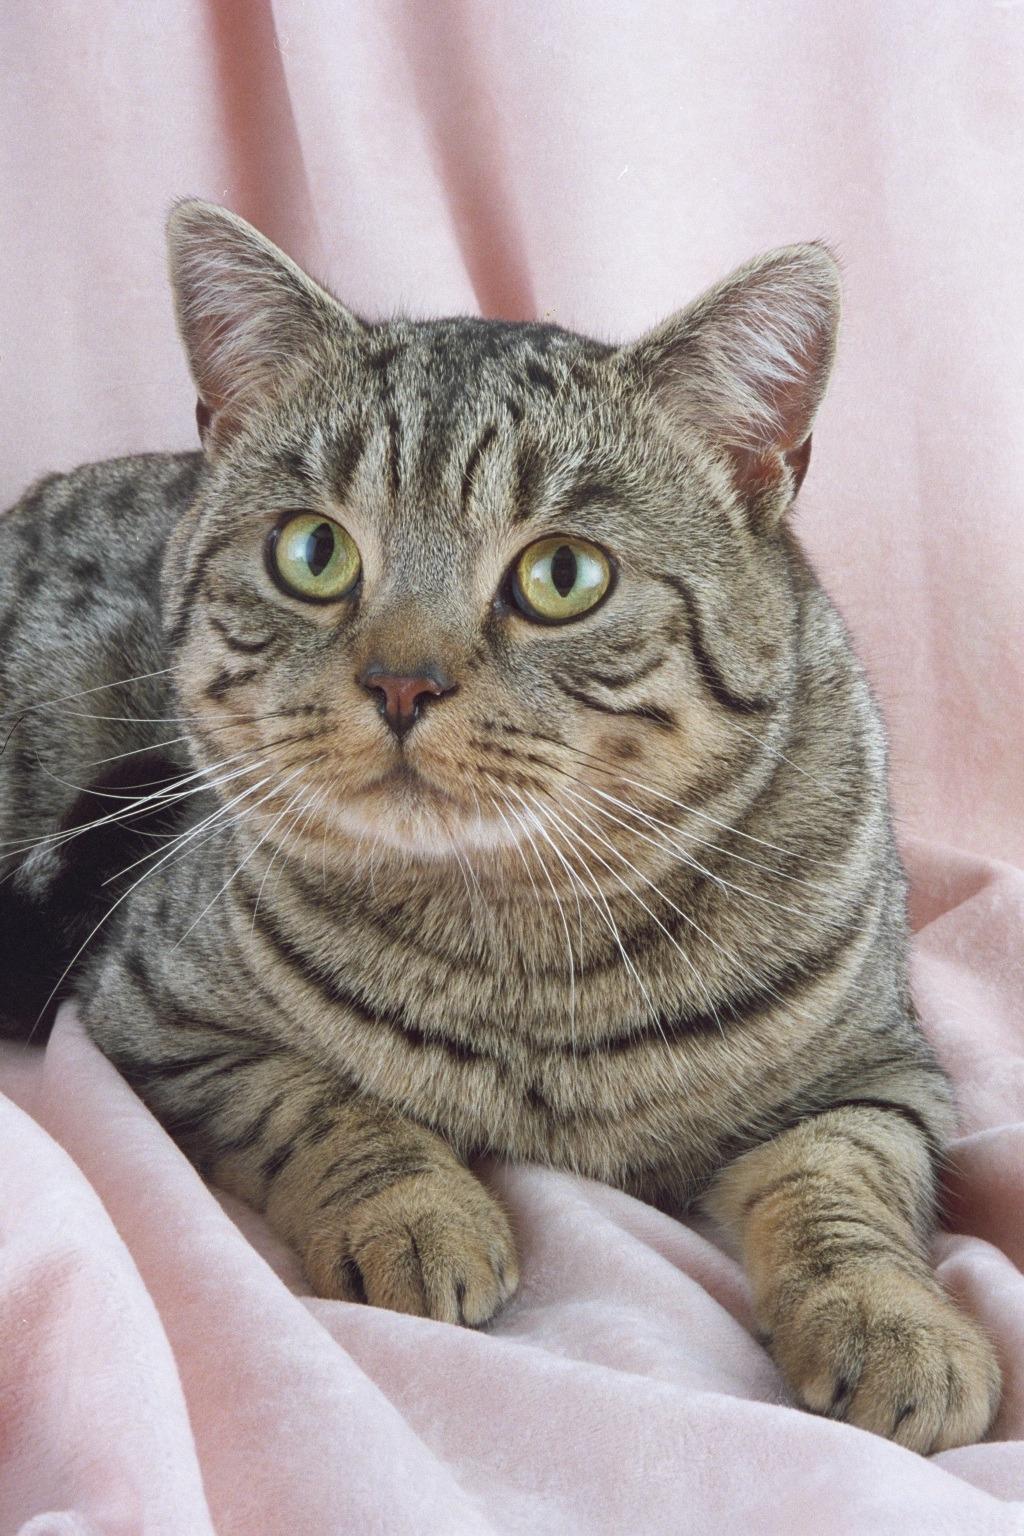 Modern Design Ideas for the British Shorthair Tabby Cat